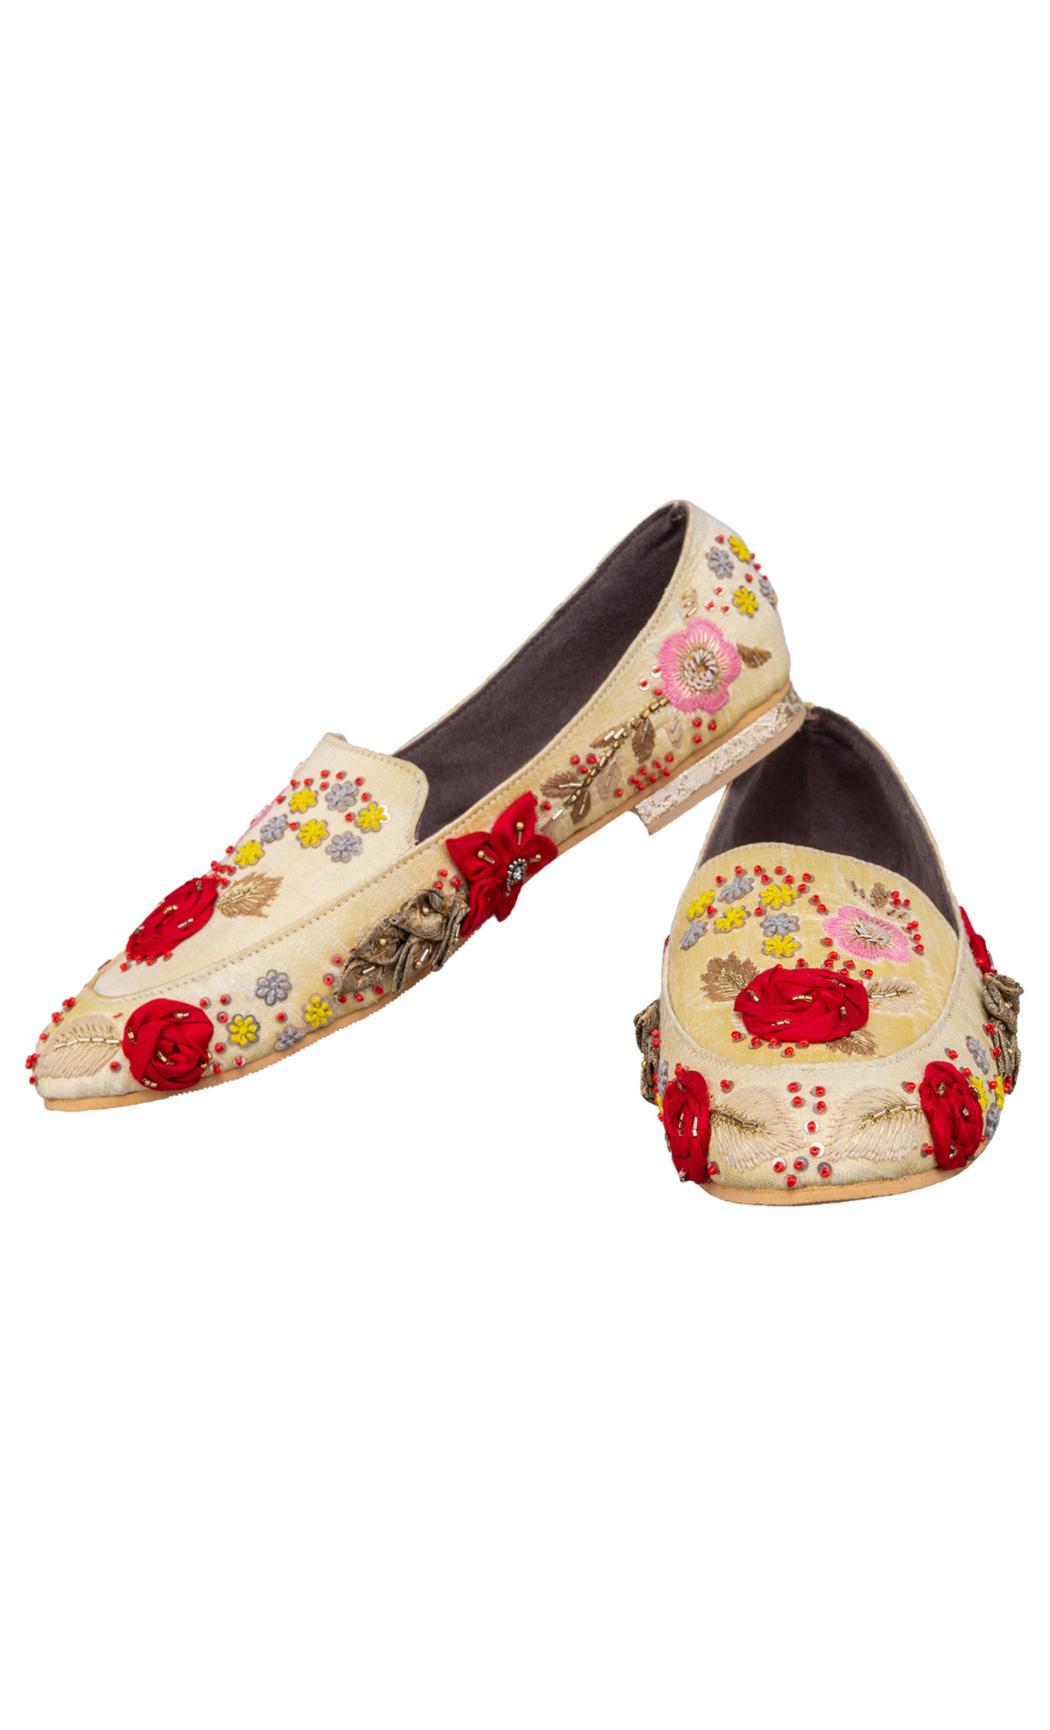 Beige Aara Loafers - Buy Online